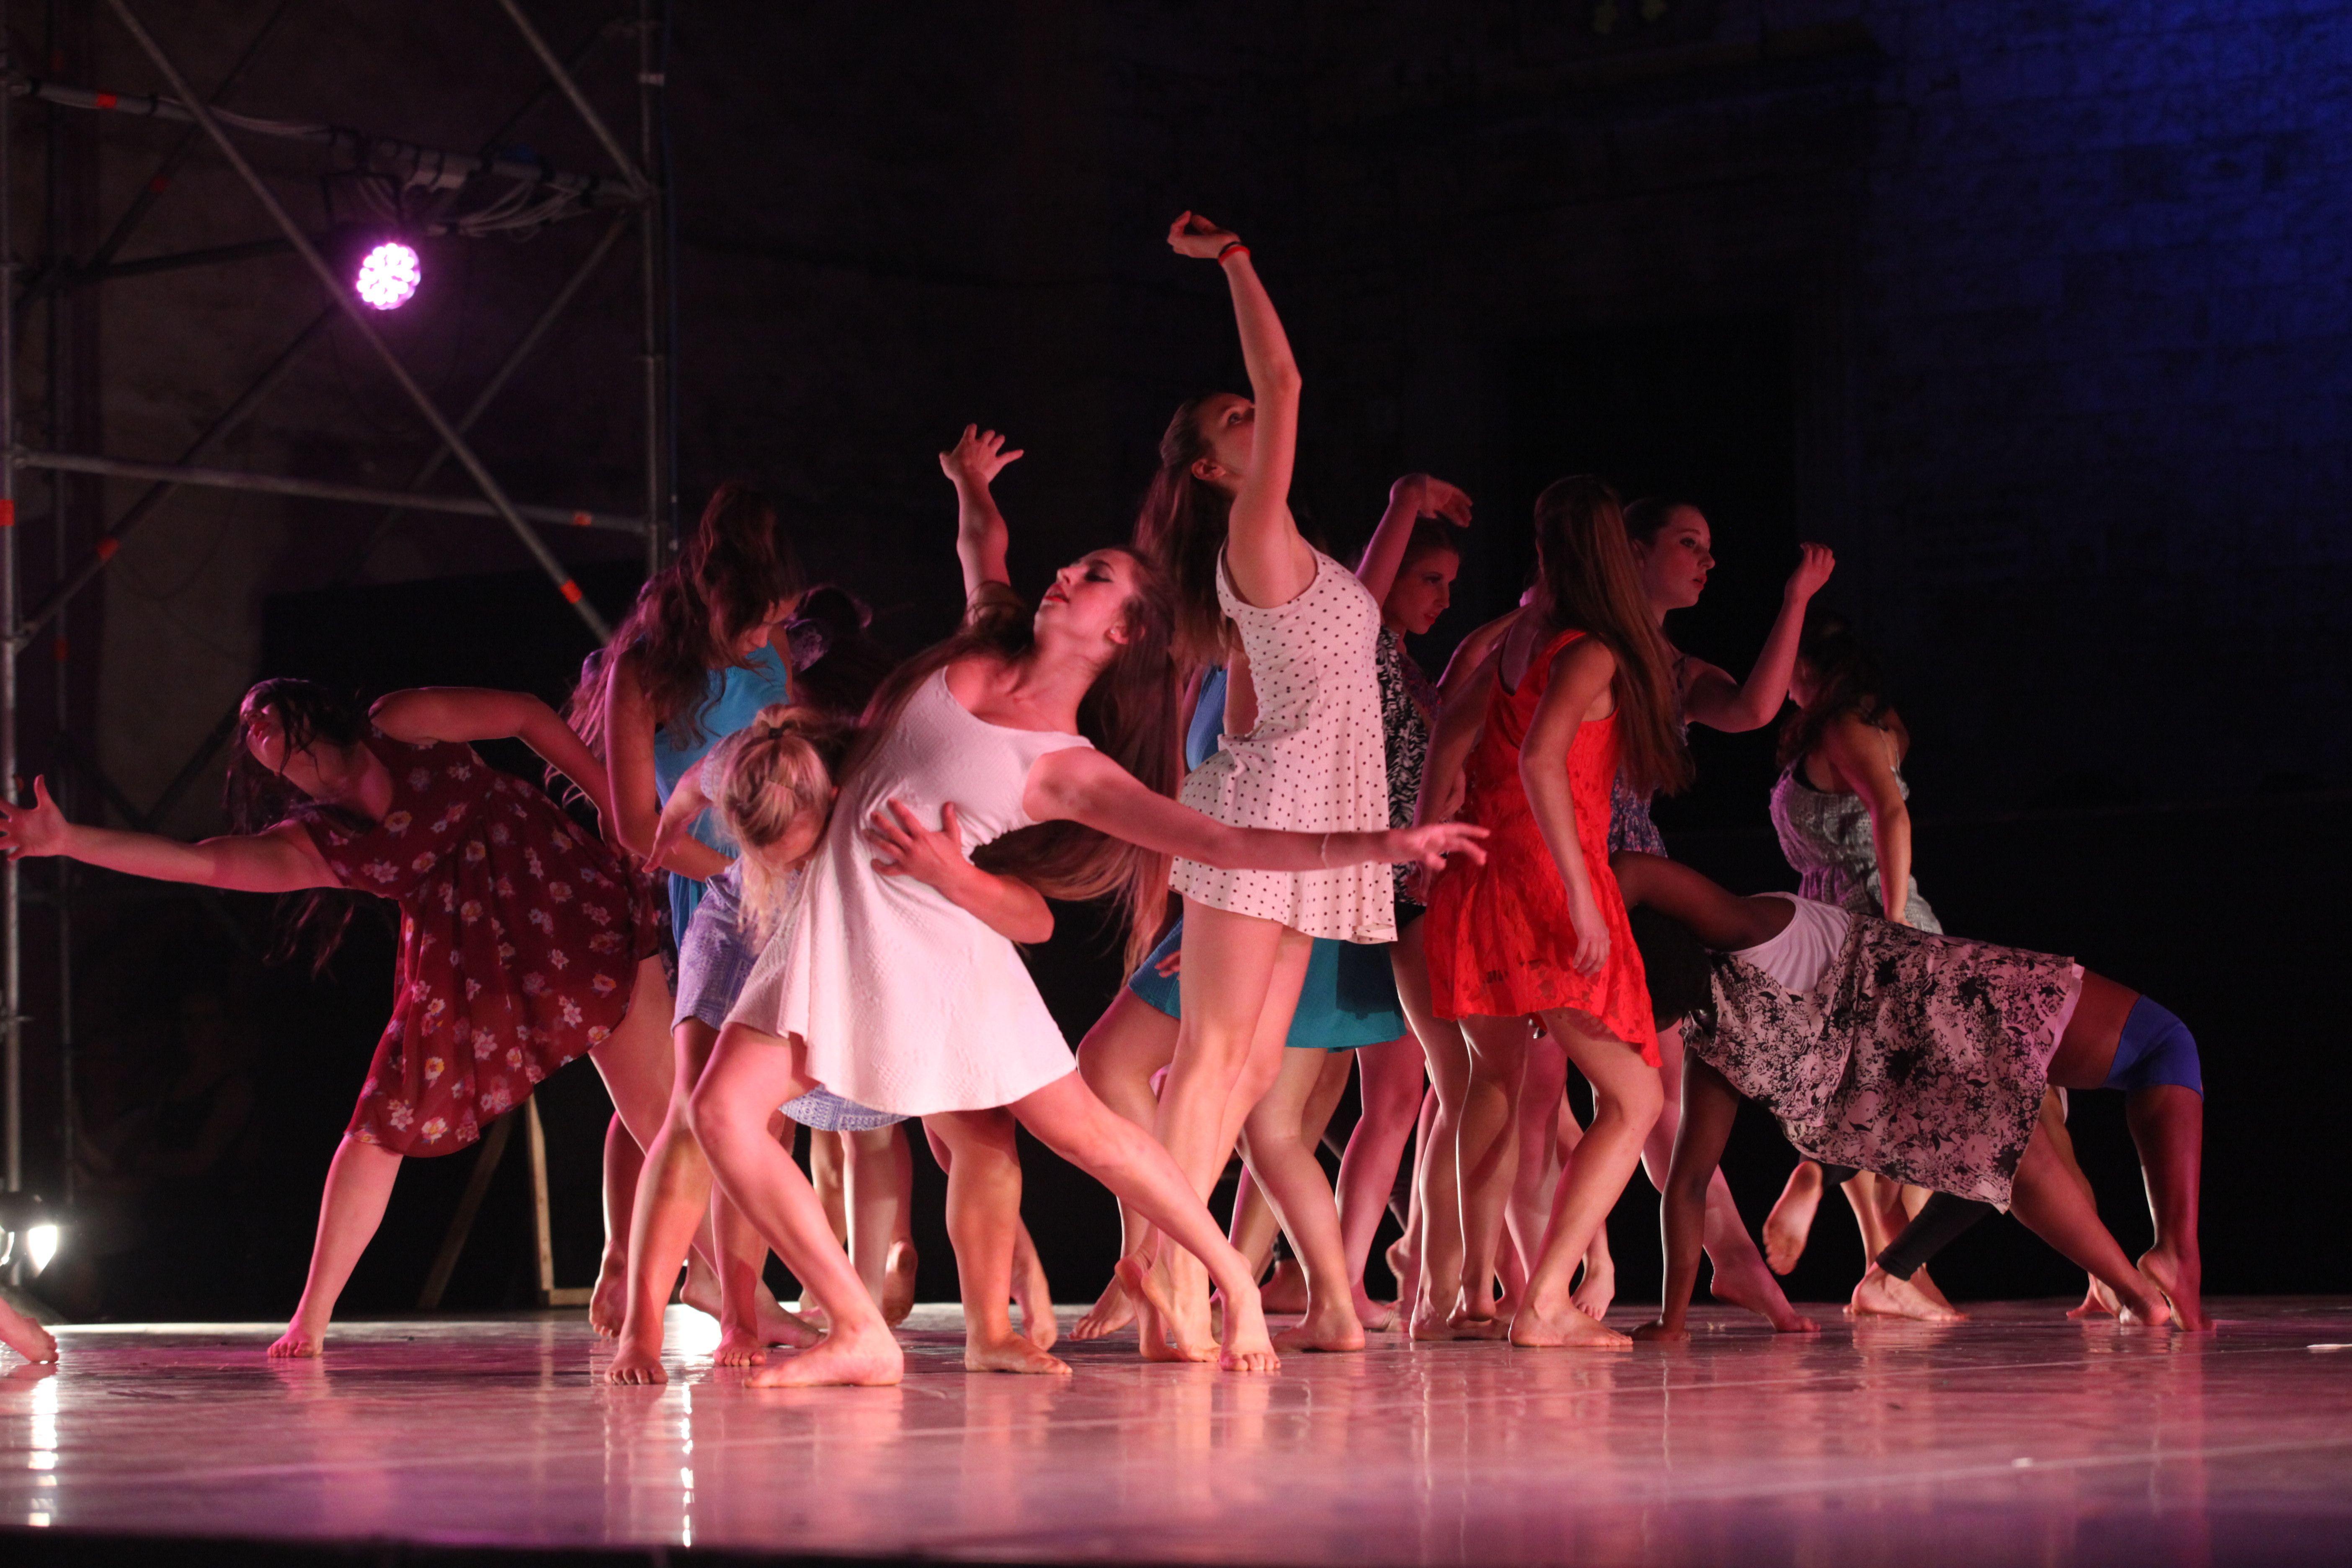 WDM Gala Performance - World Dance Movement Italy. www